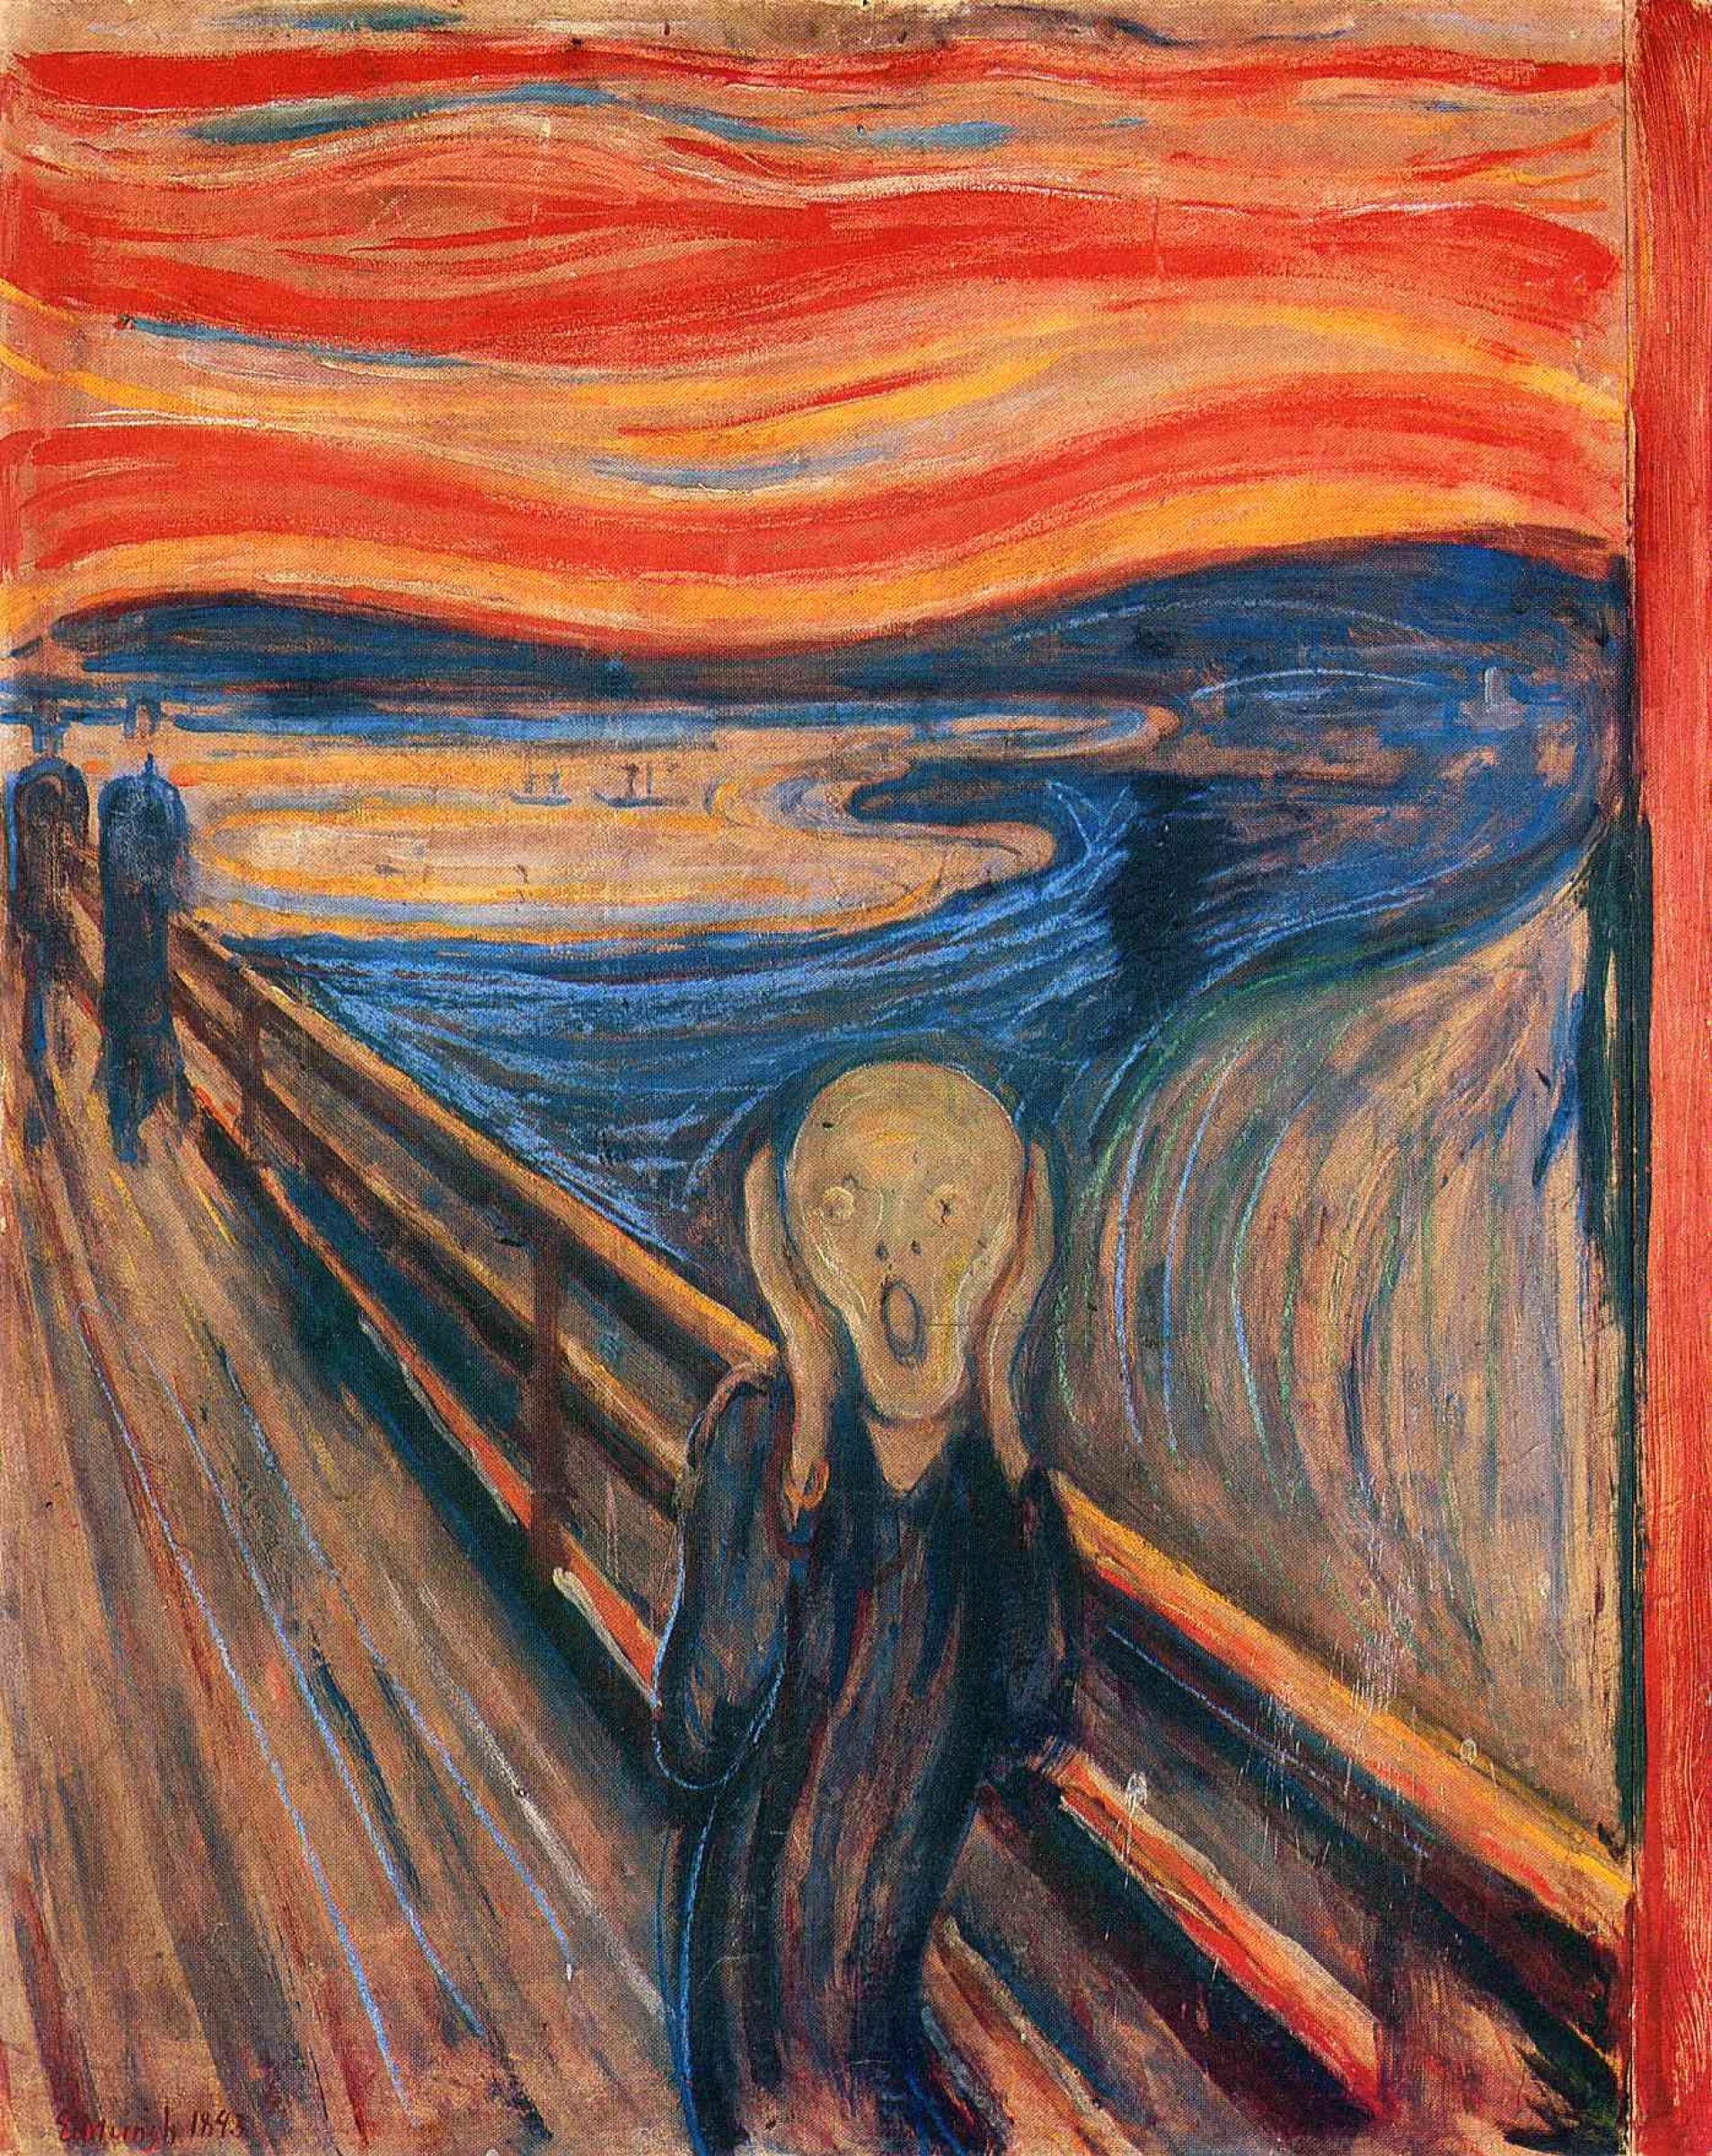 Edvard Munch. Scream